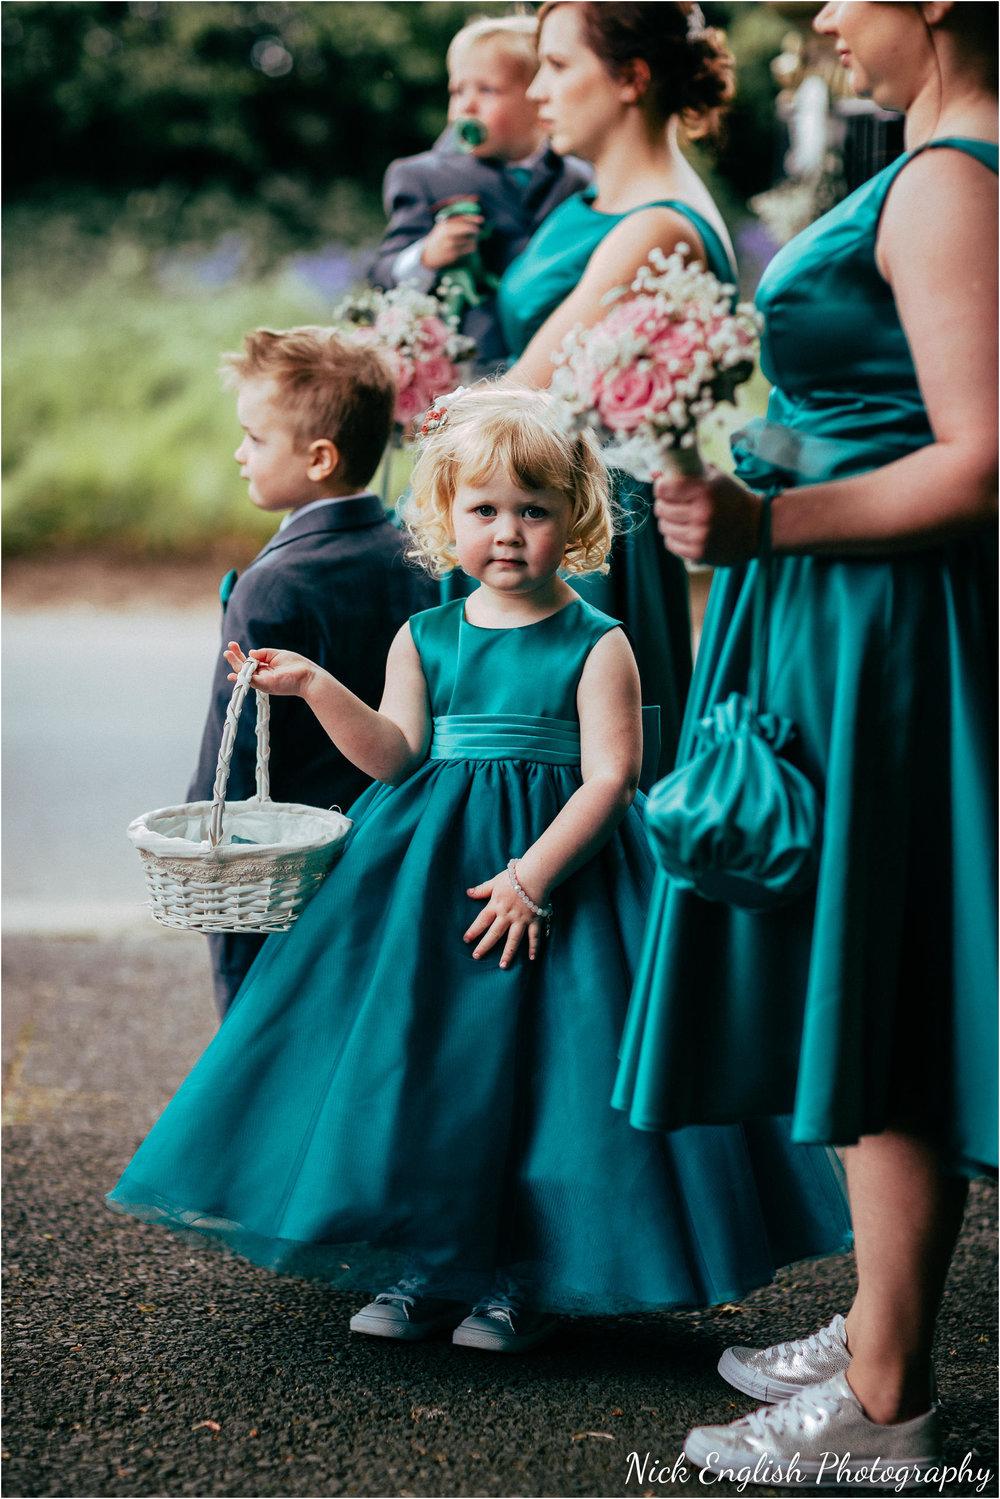 Marquee Wedding Photography Lancashire Nick English Wedding Photographer-48.jpg